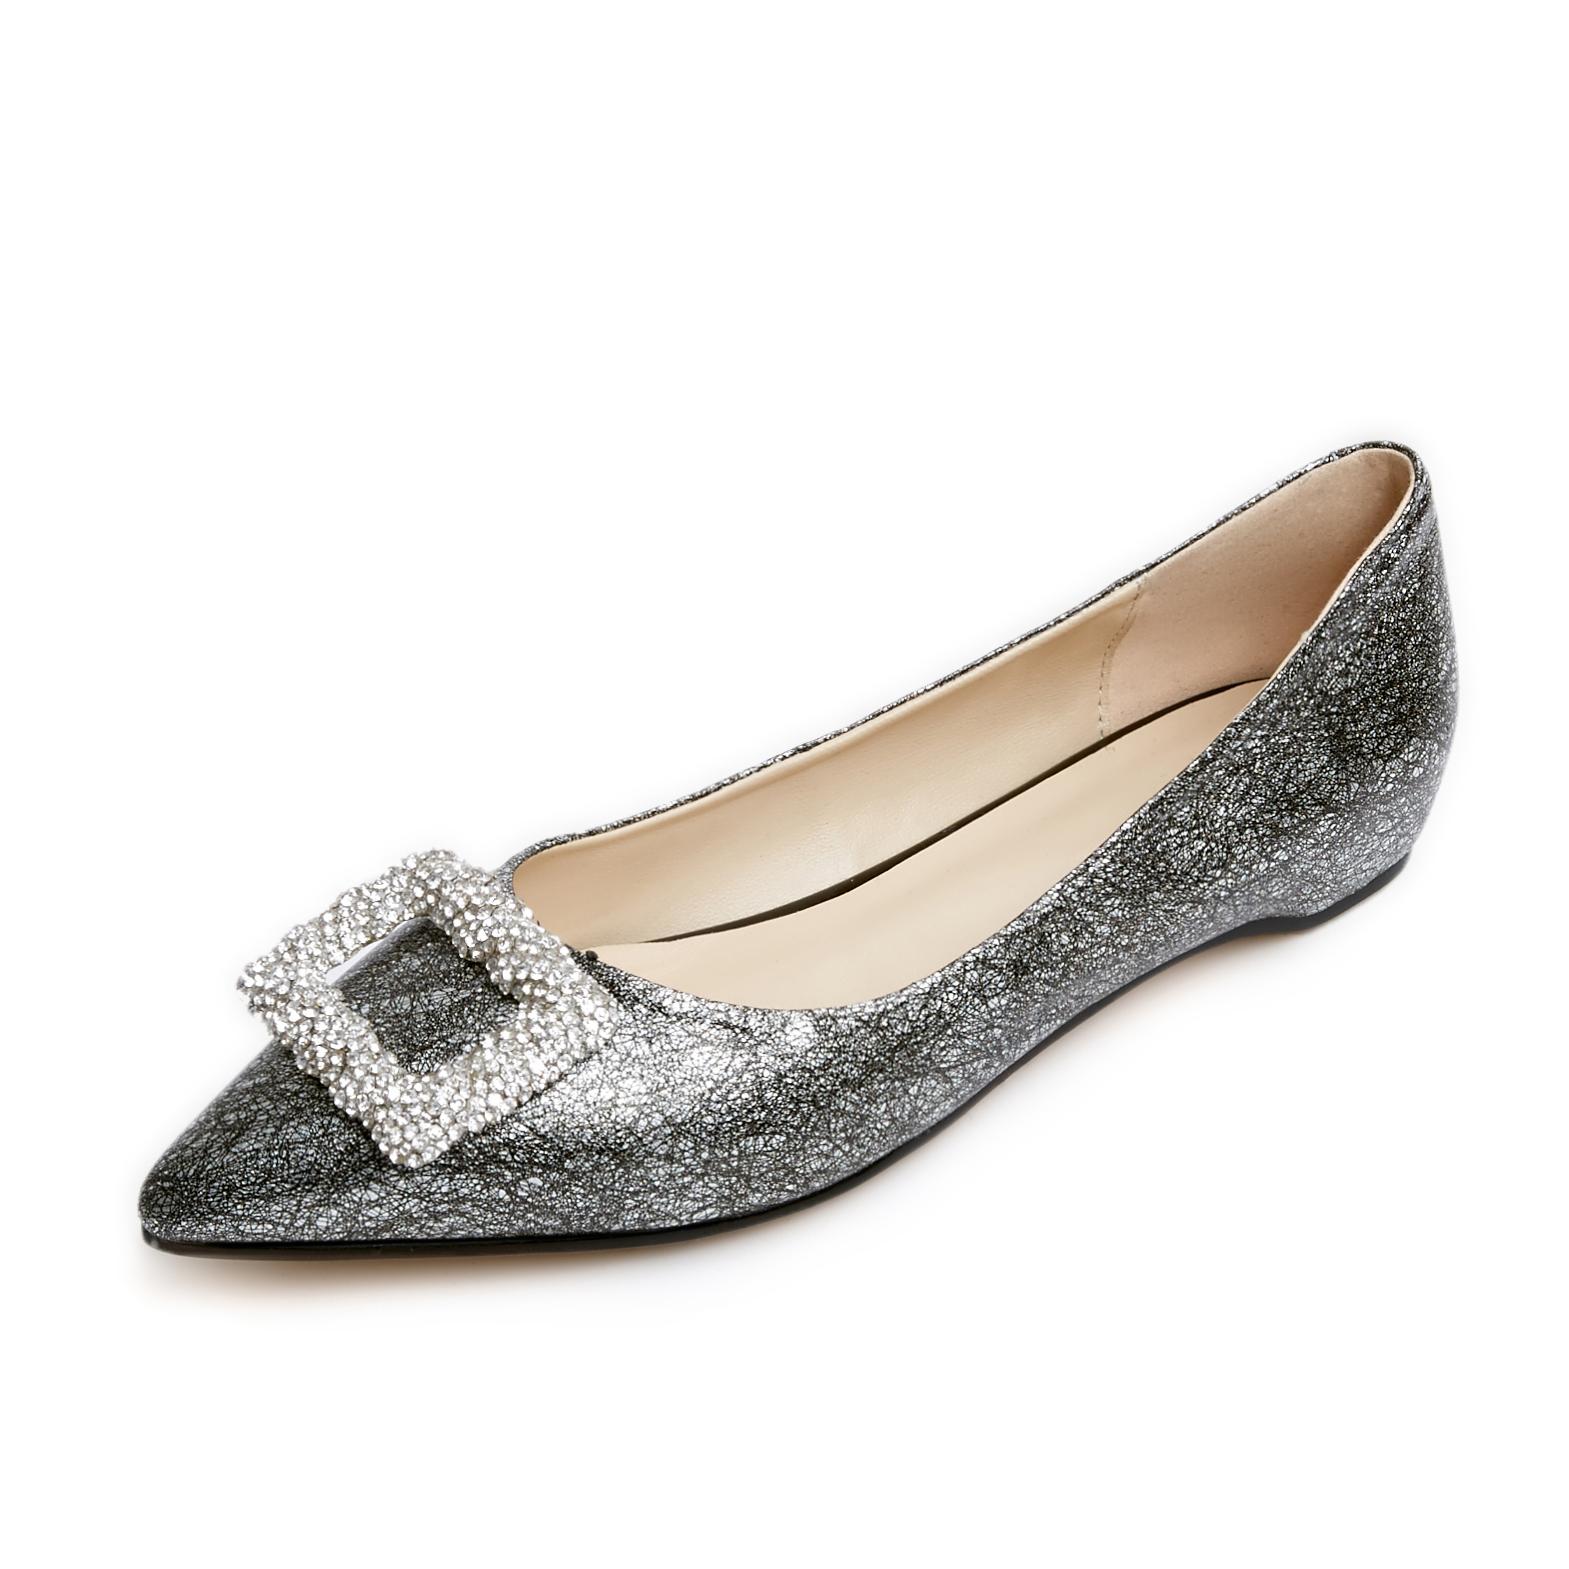 US  48 - Arden Furtado 2018 spring autumn pointed toe woman shoes ladies  fashion crystal flats - www.ardenfurtado.com 196d0e65627f